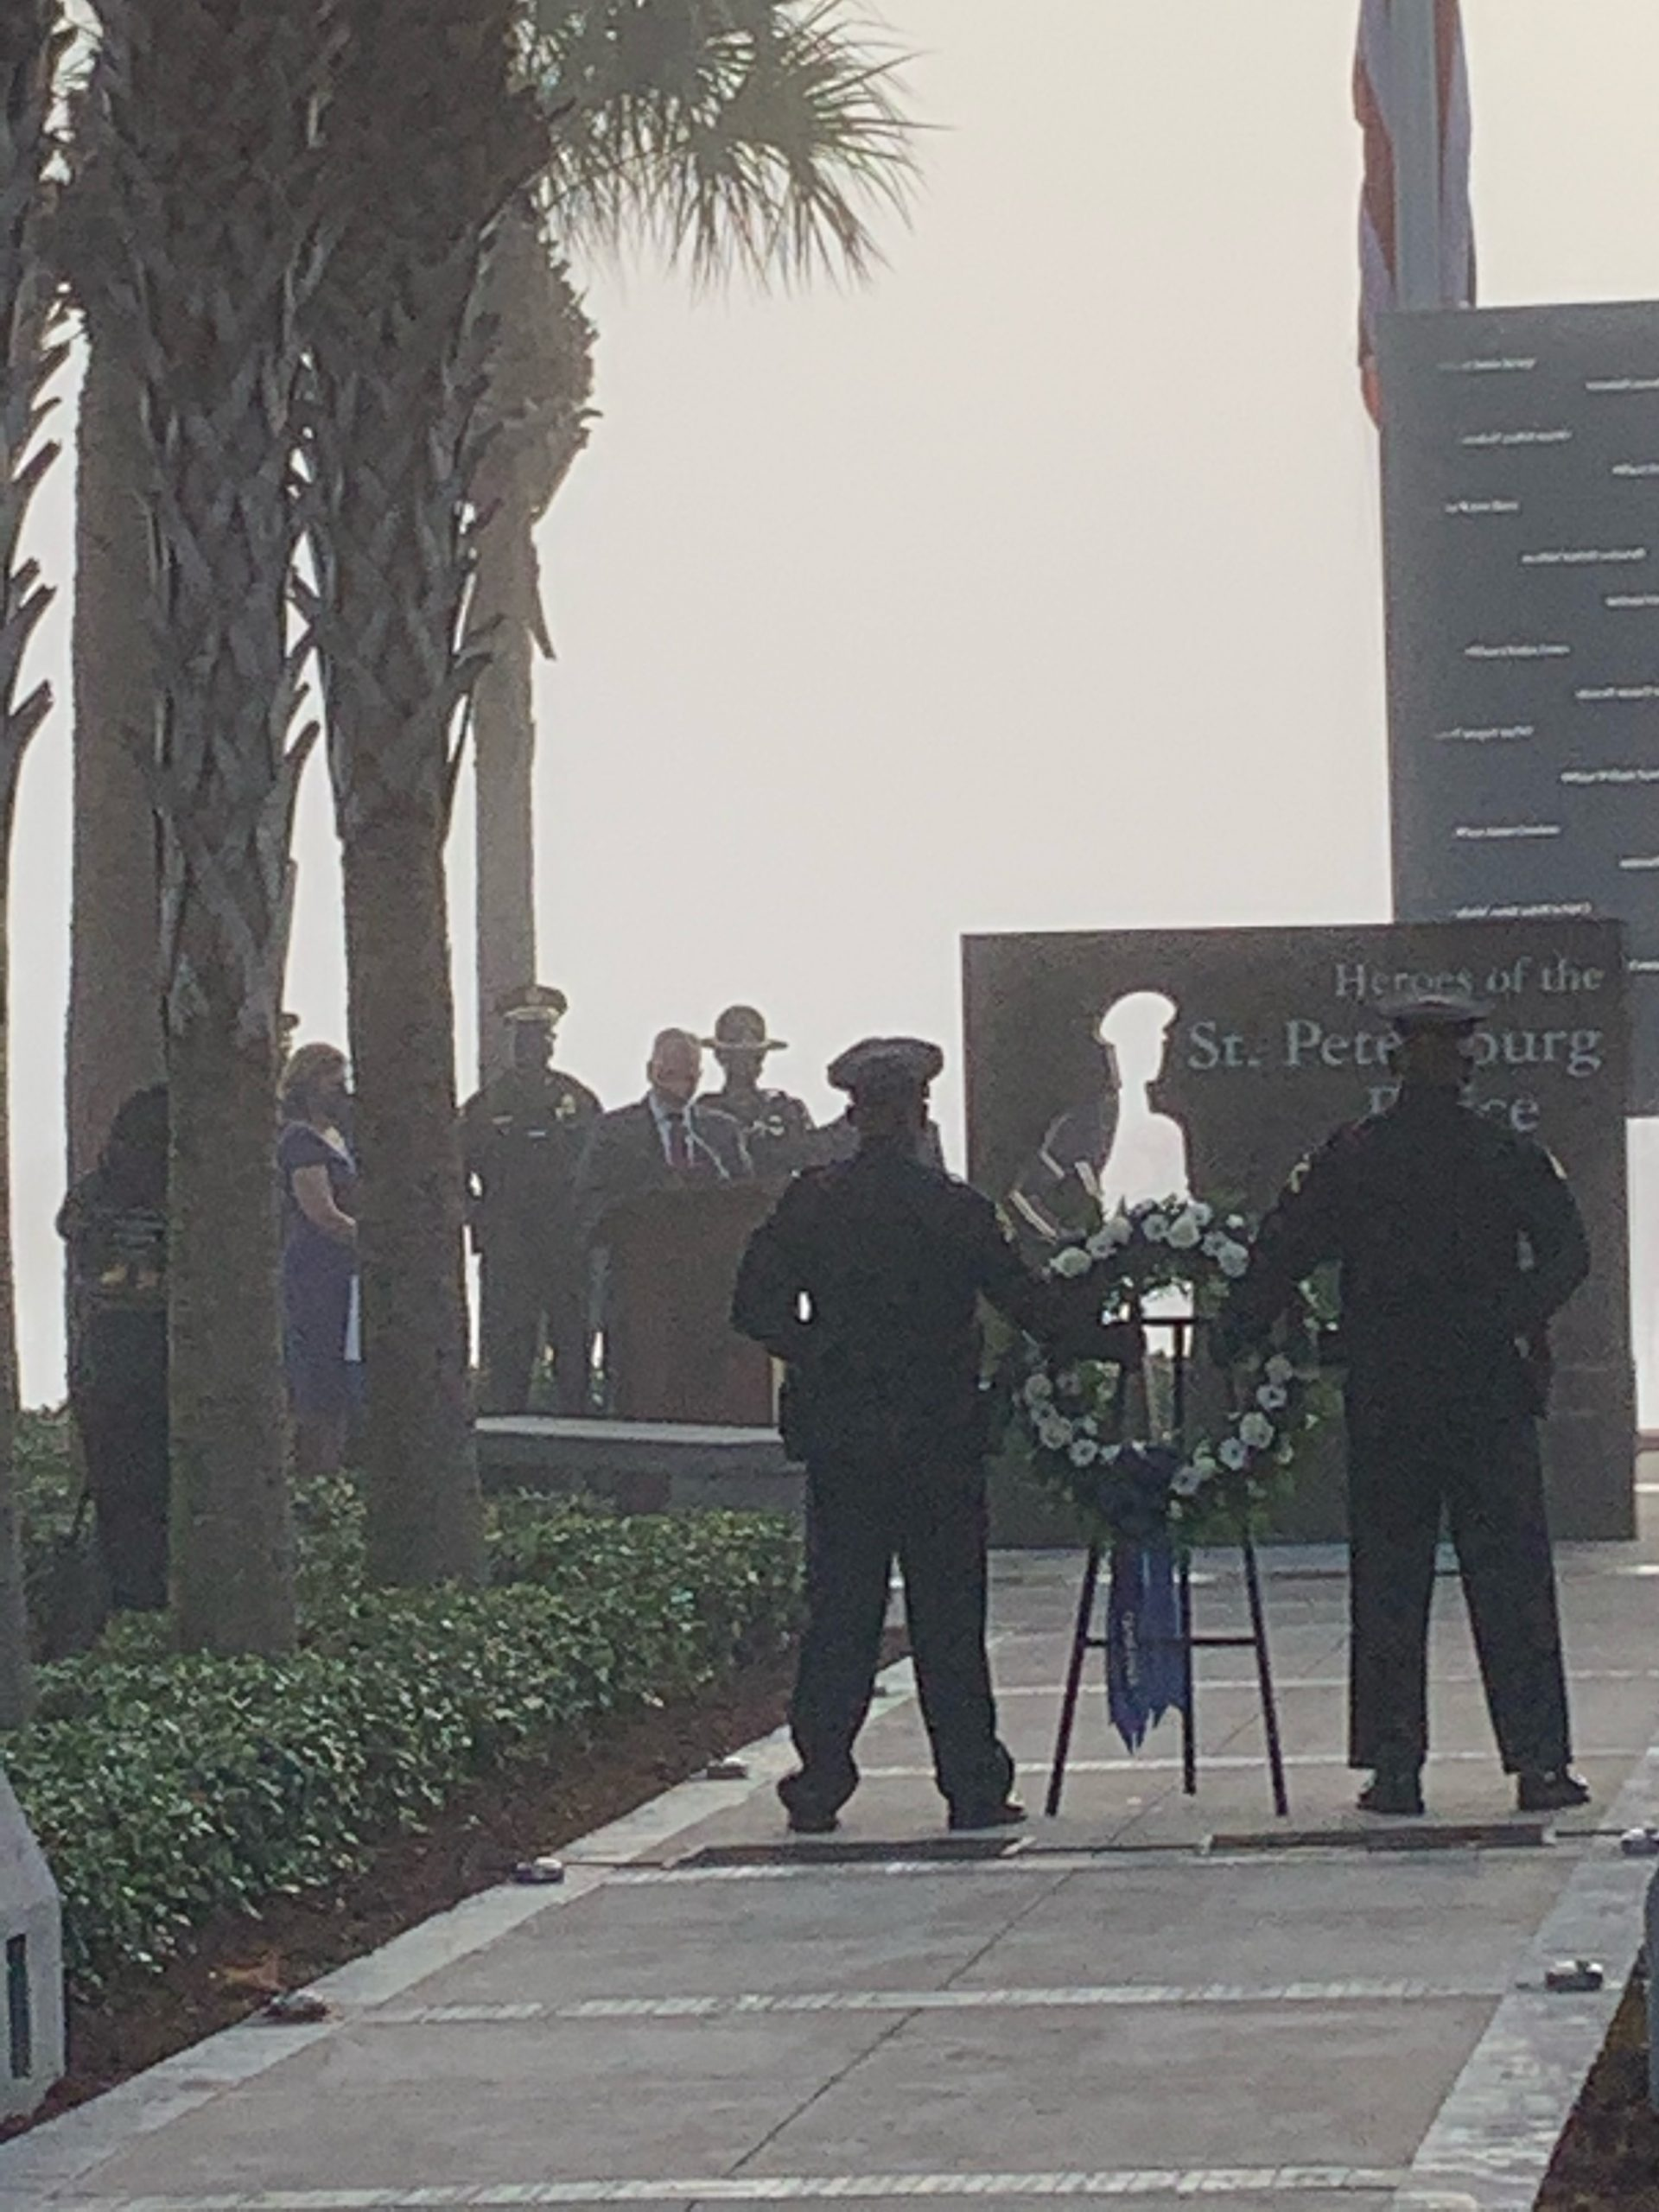 Ten Year Anniversary Memorial Event